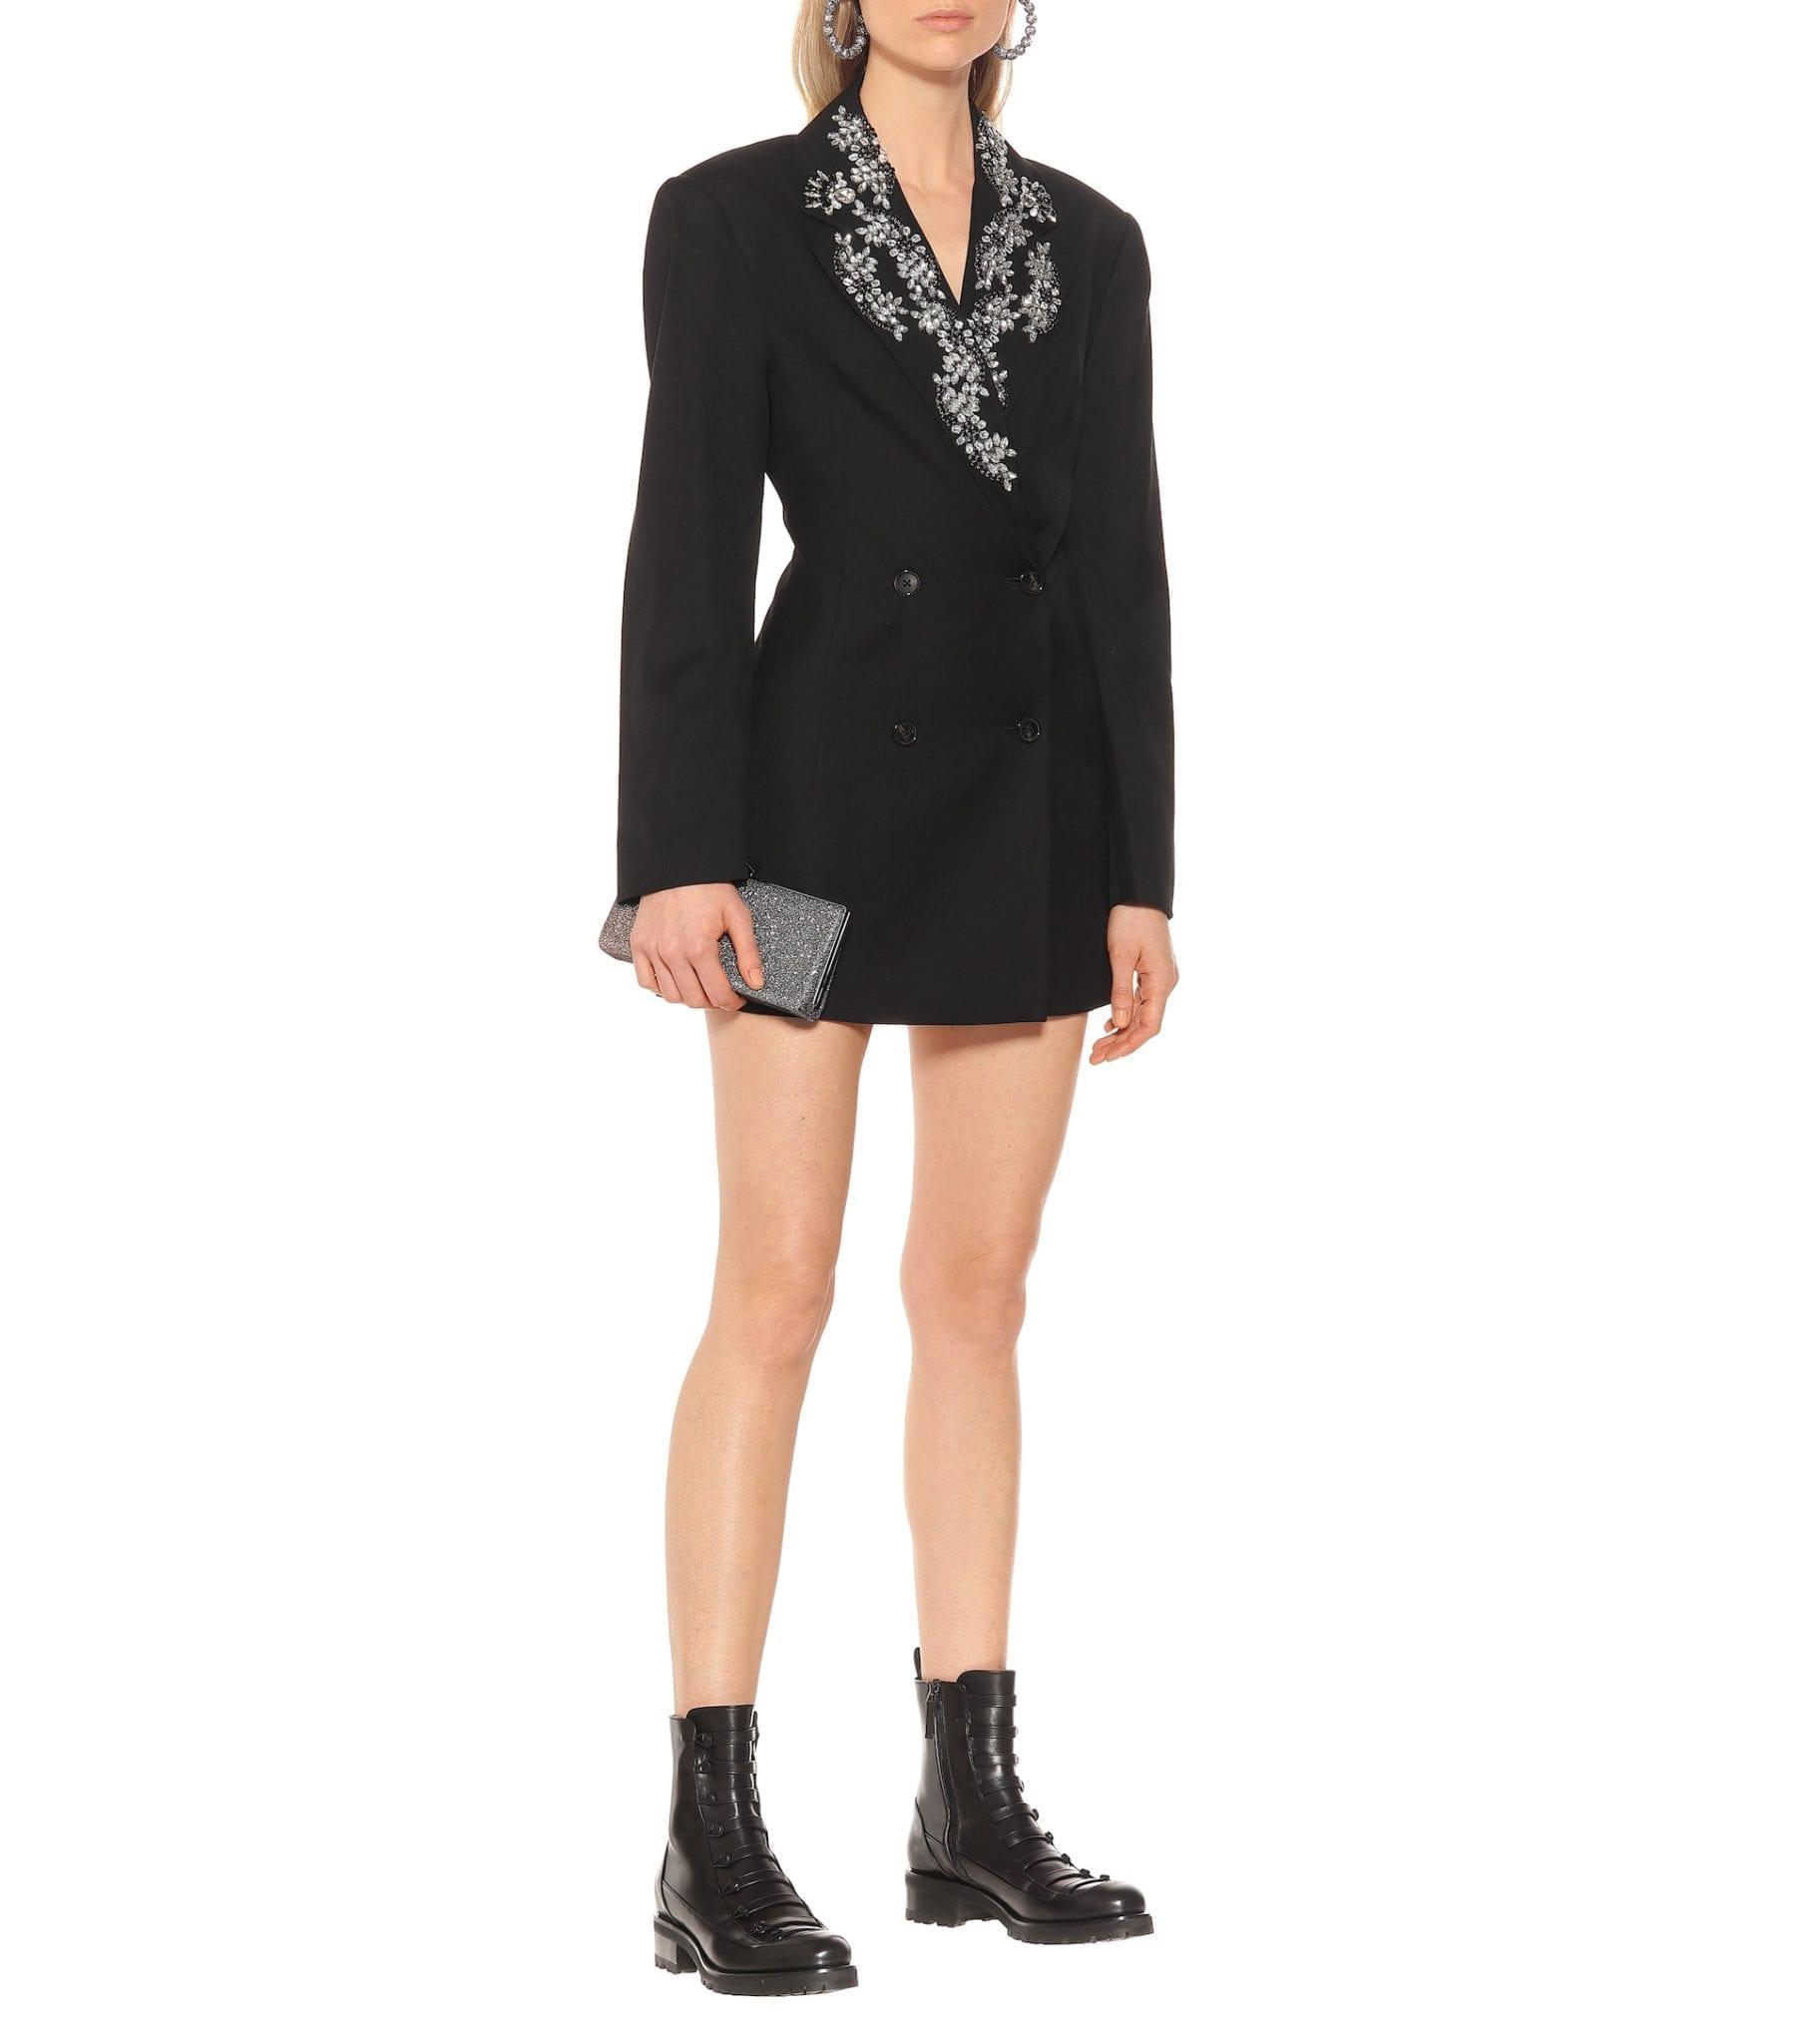 ROTATE BIRGER CHRISTENSEN Wool-Blend Blazer Black Dress